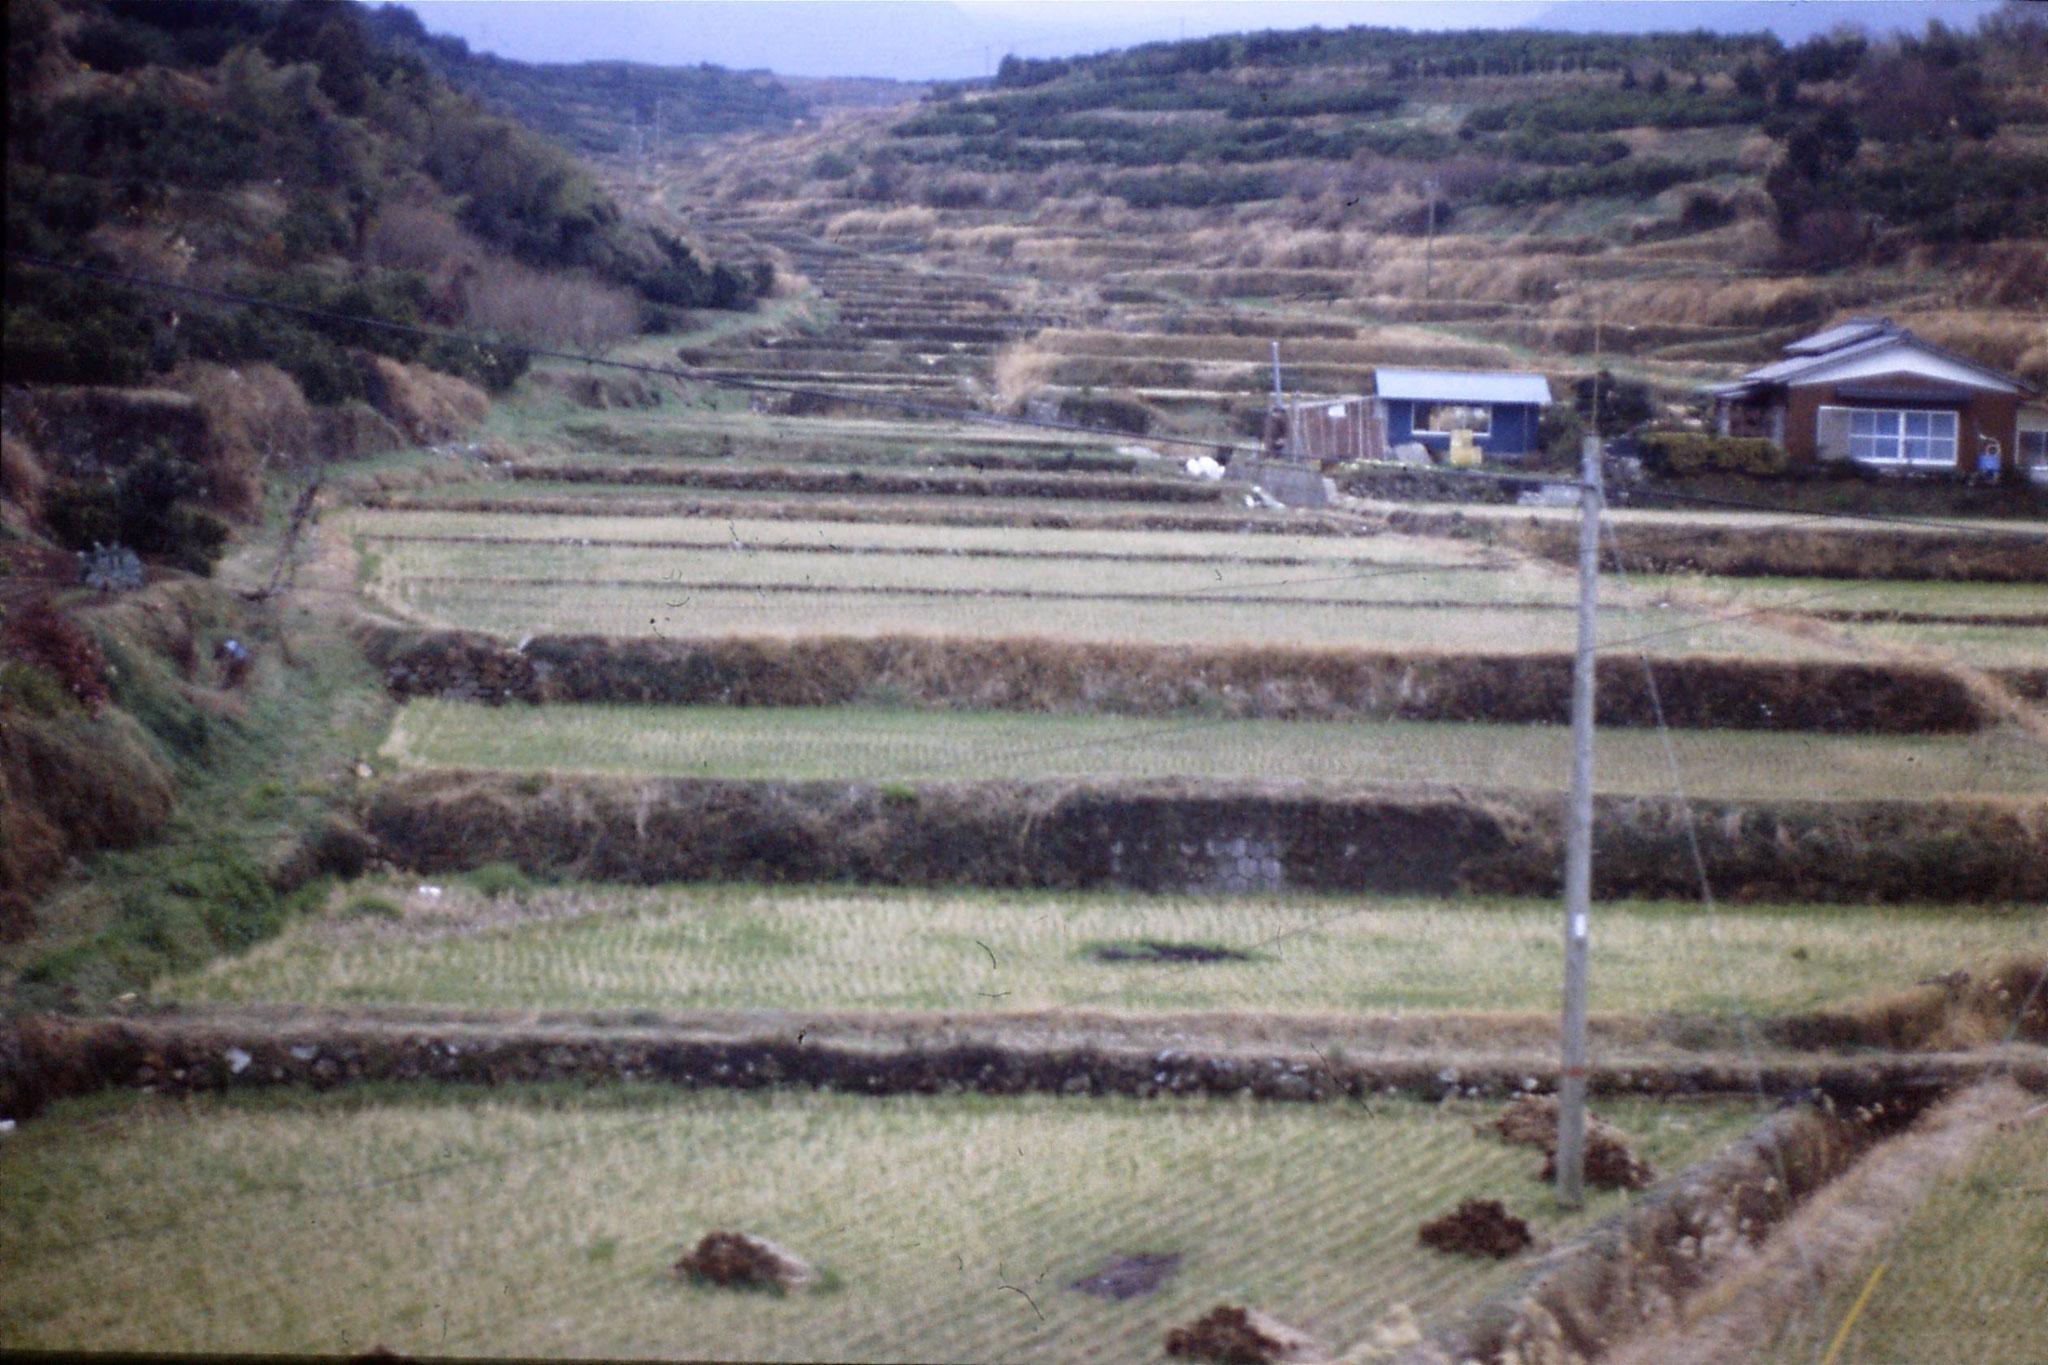 19/1/1989: 34: before Kagoshima